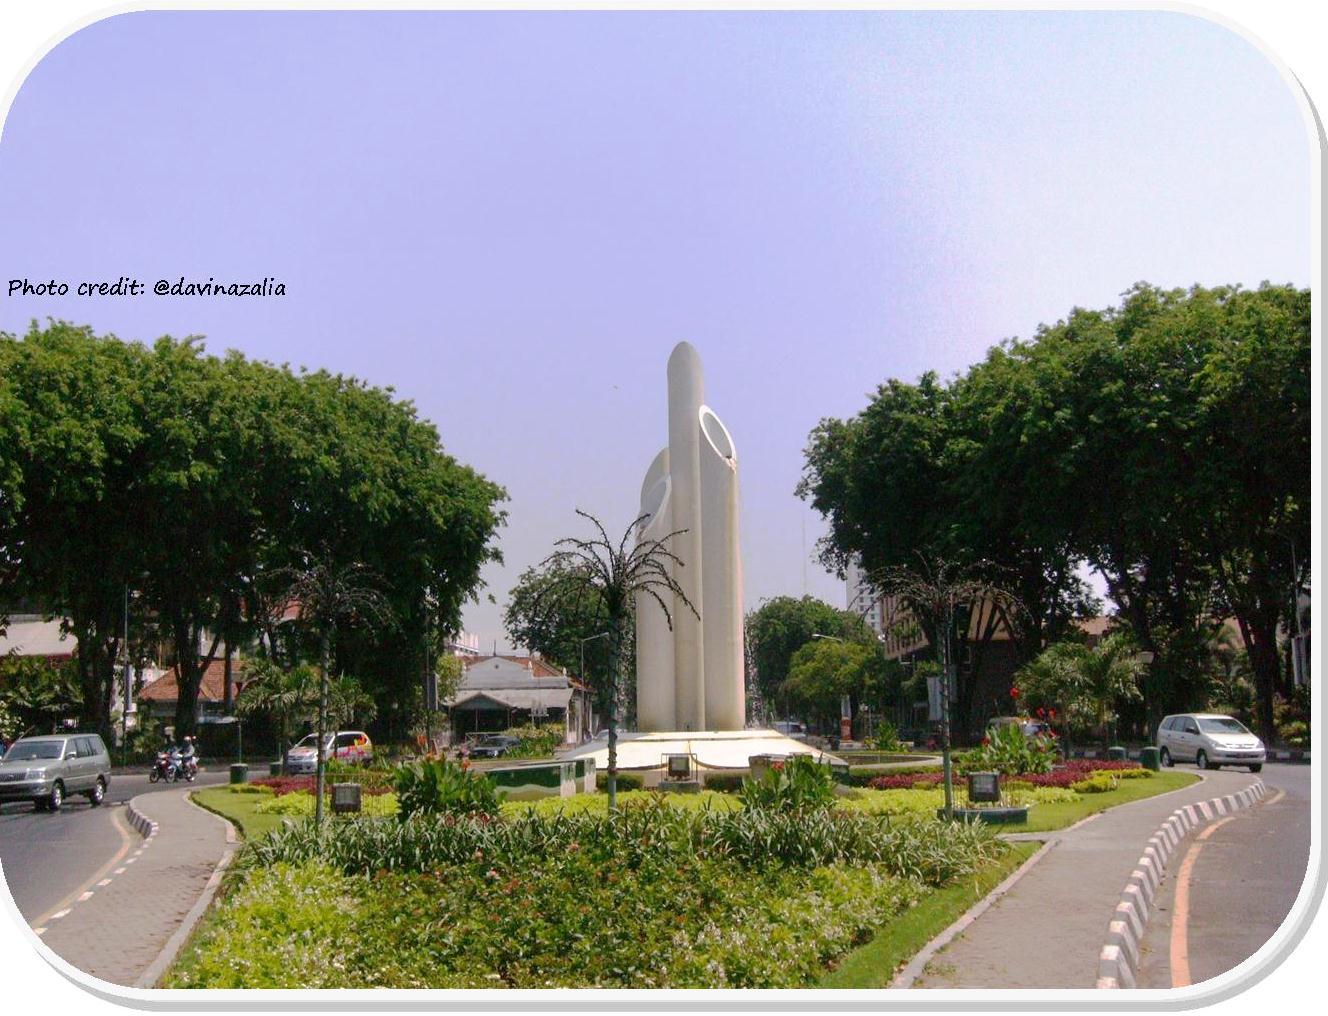 Misteri Kota Pahlawan Rainbow Monumen Bambu Runcing Dibangun Pusat Surabaya